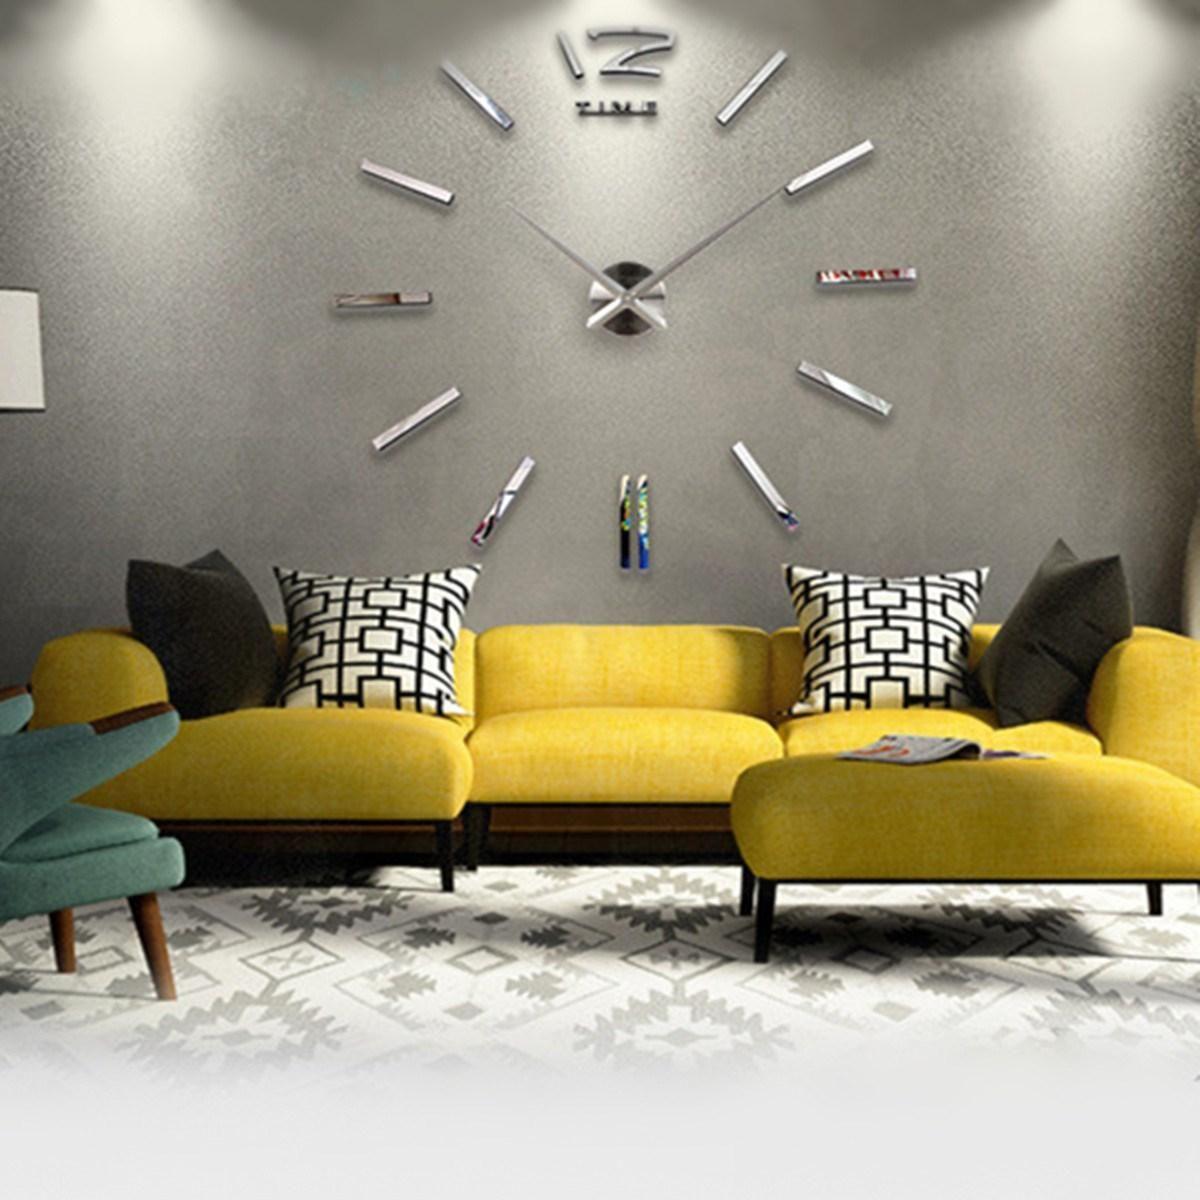 Acryl 3D DIY Spiegelfläche Wandaufkleber Uhr Tapeten Wandbilder Aufkleber Home Raumdekoration Moderne Kunst Decals